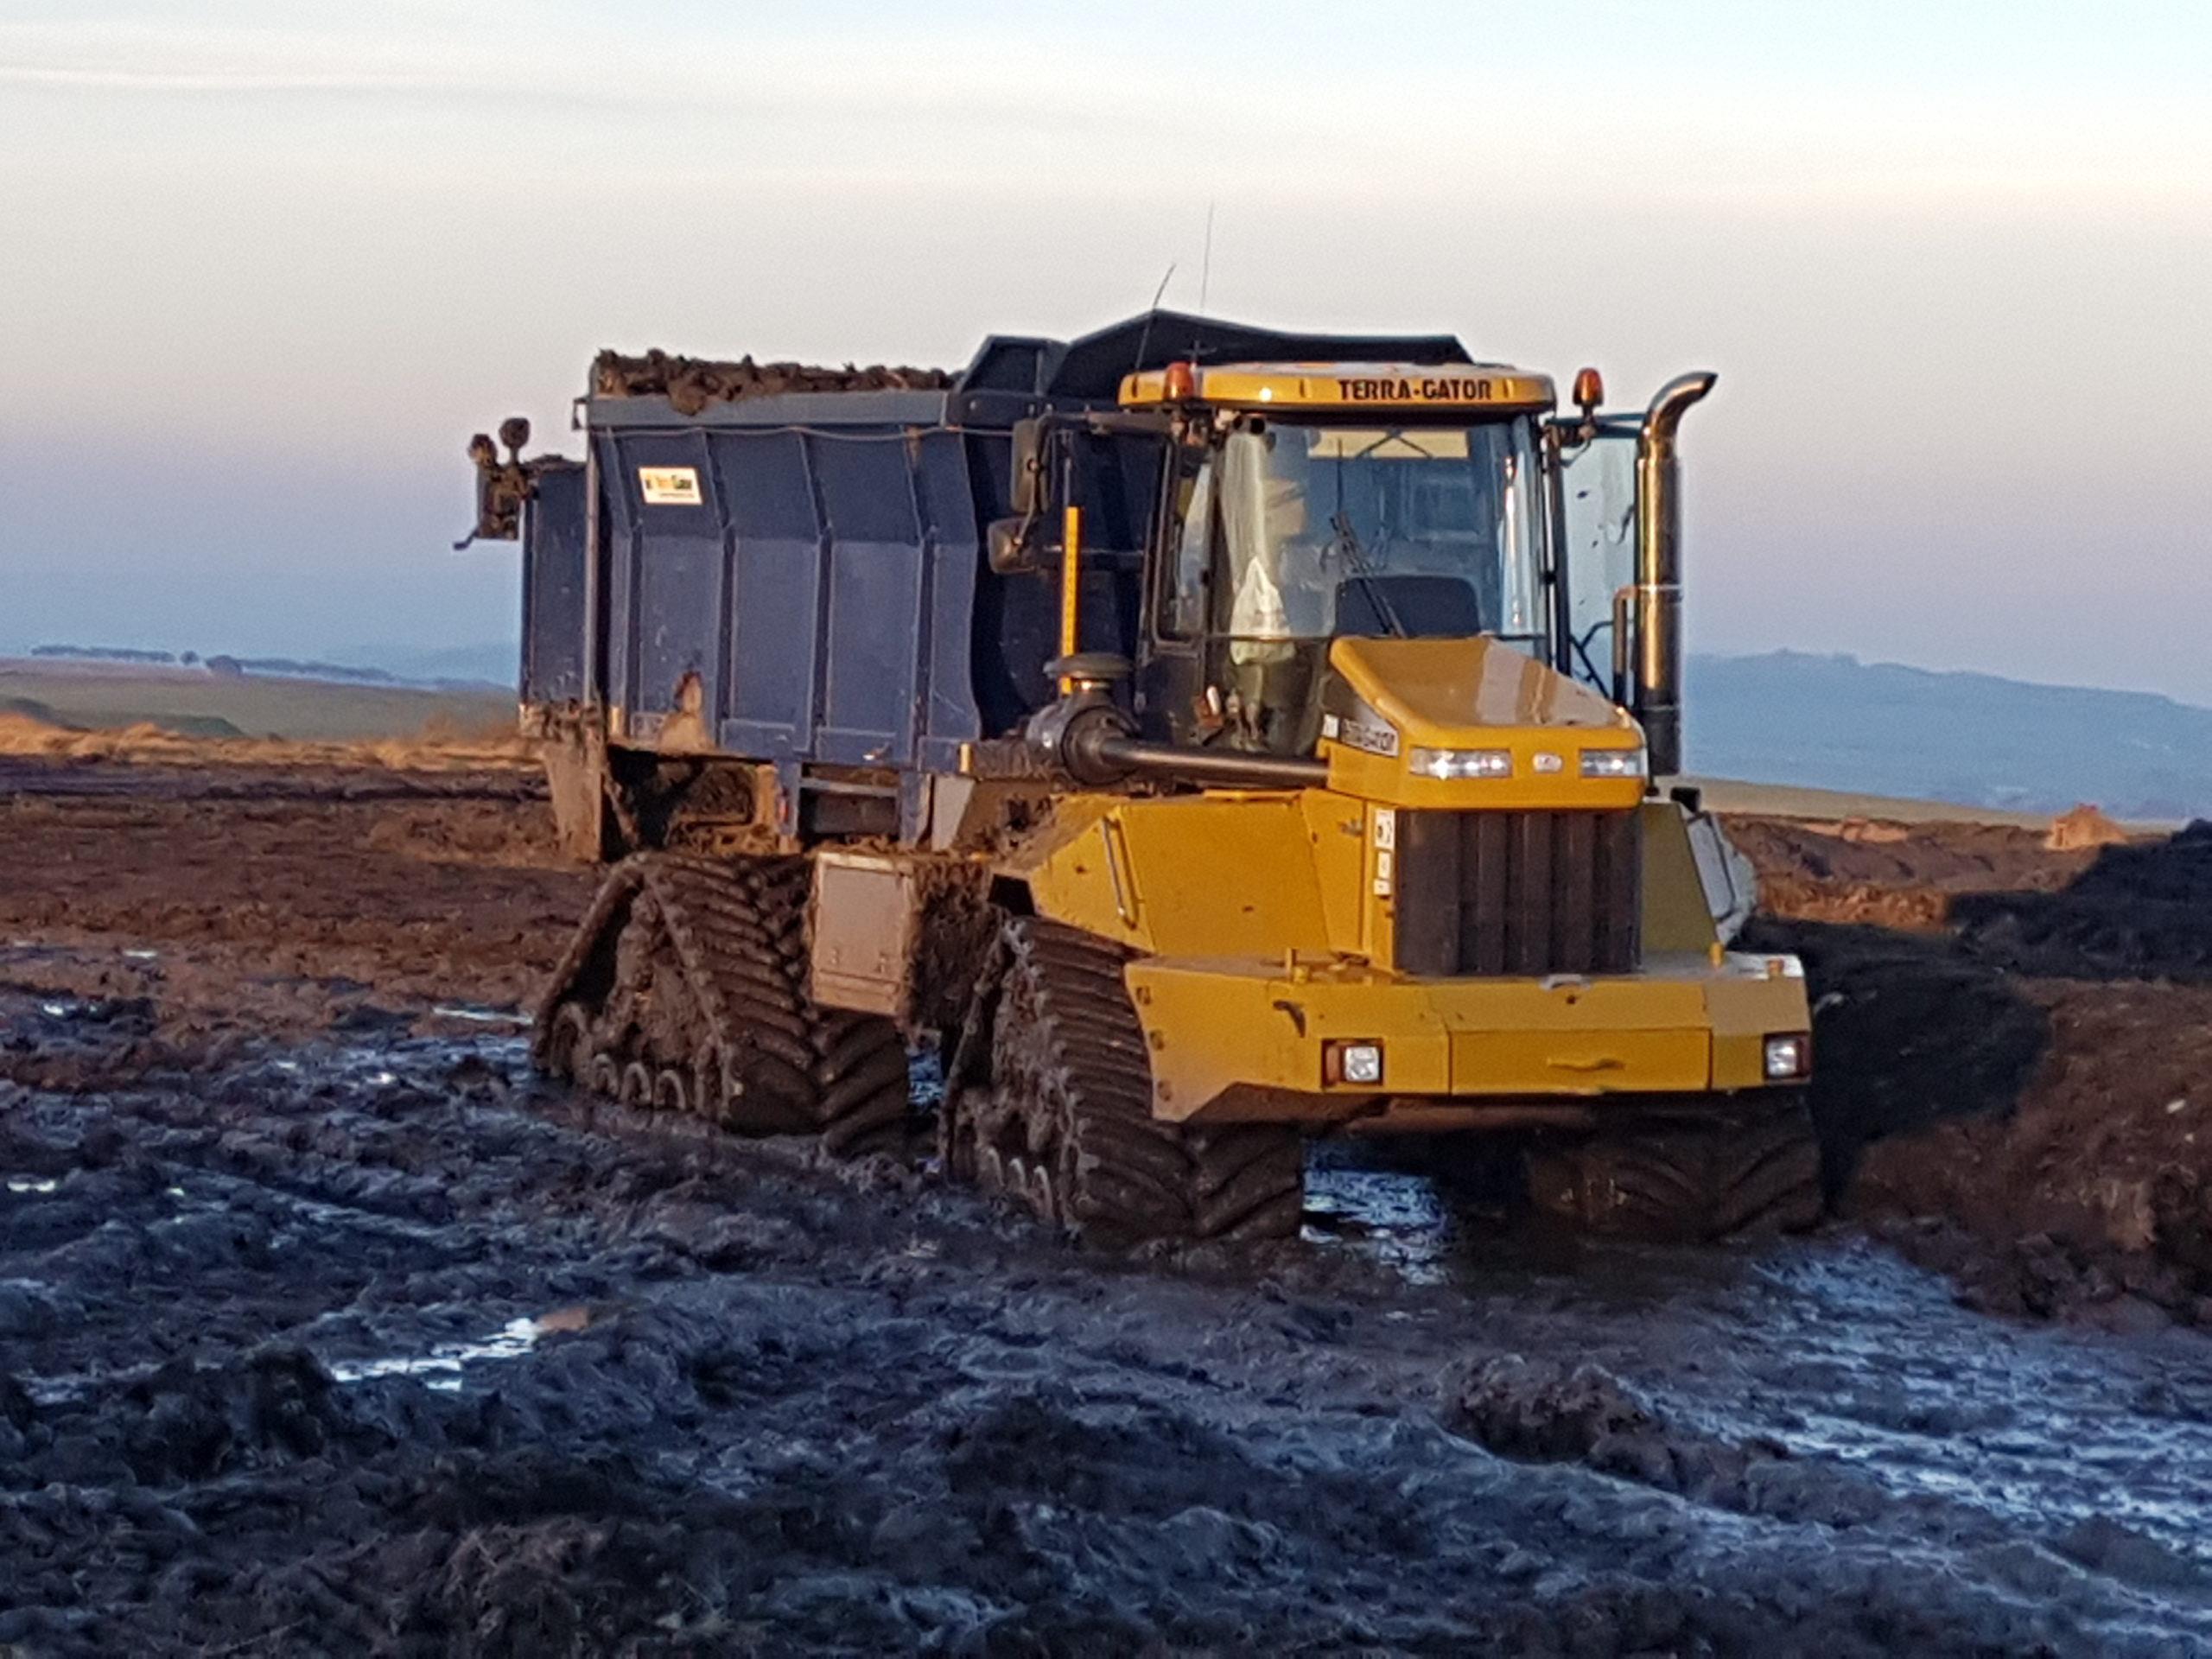 Poluzzi tracks fitted to Terragator 2104 working in Scotland